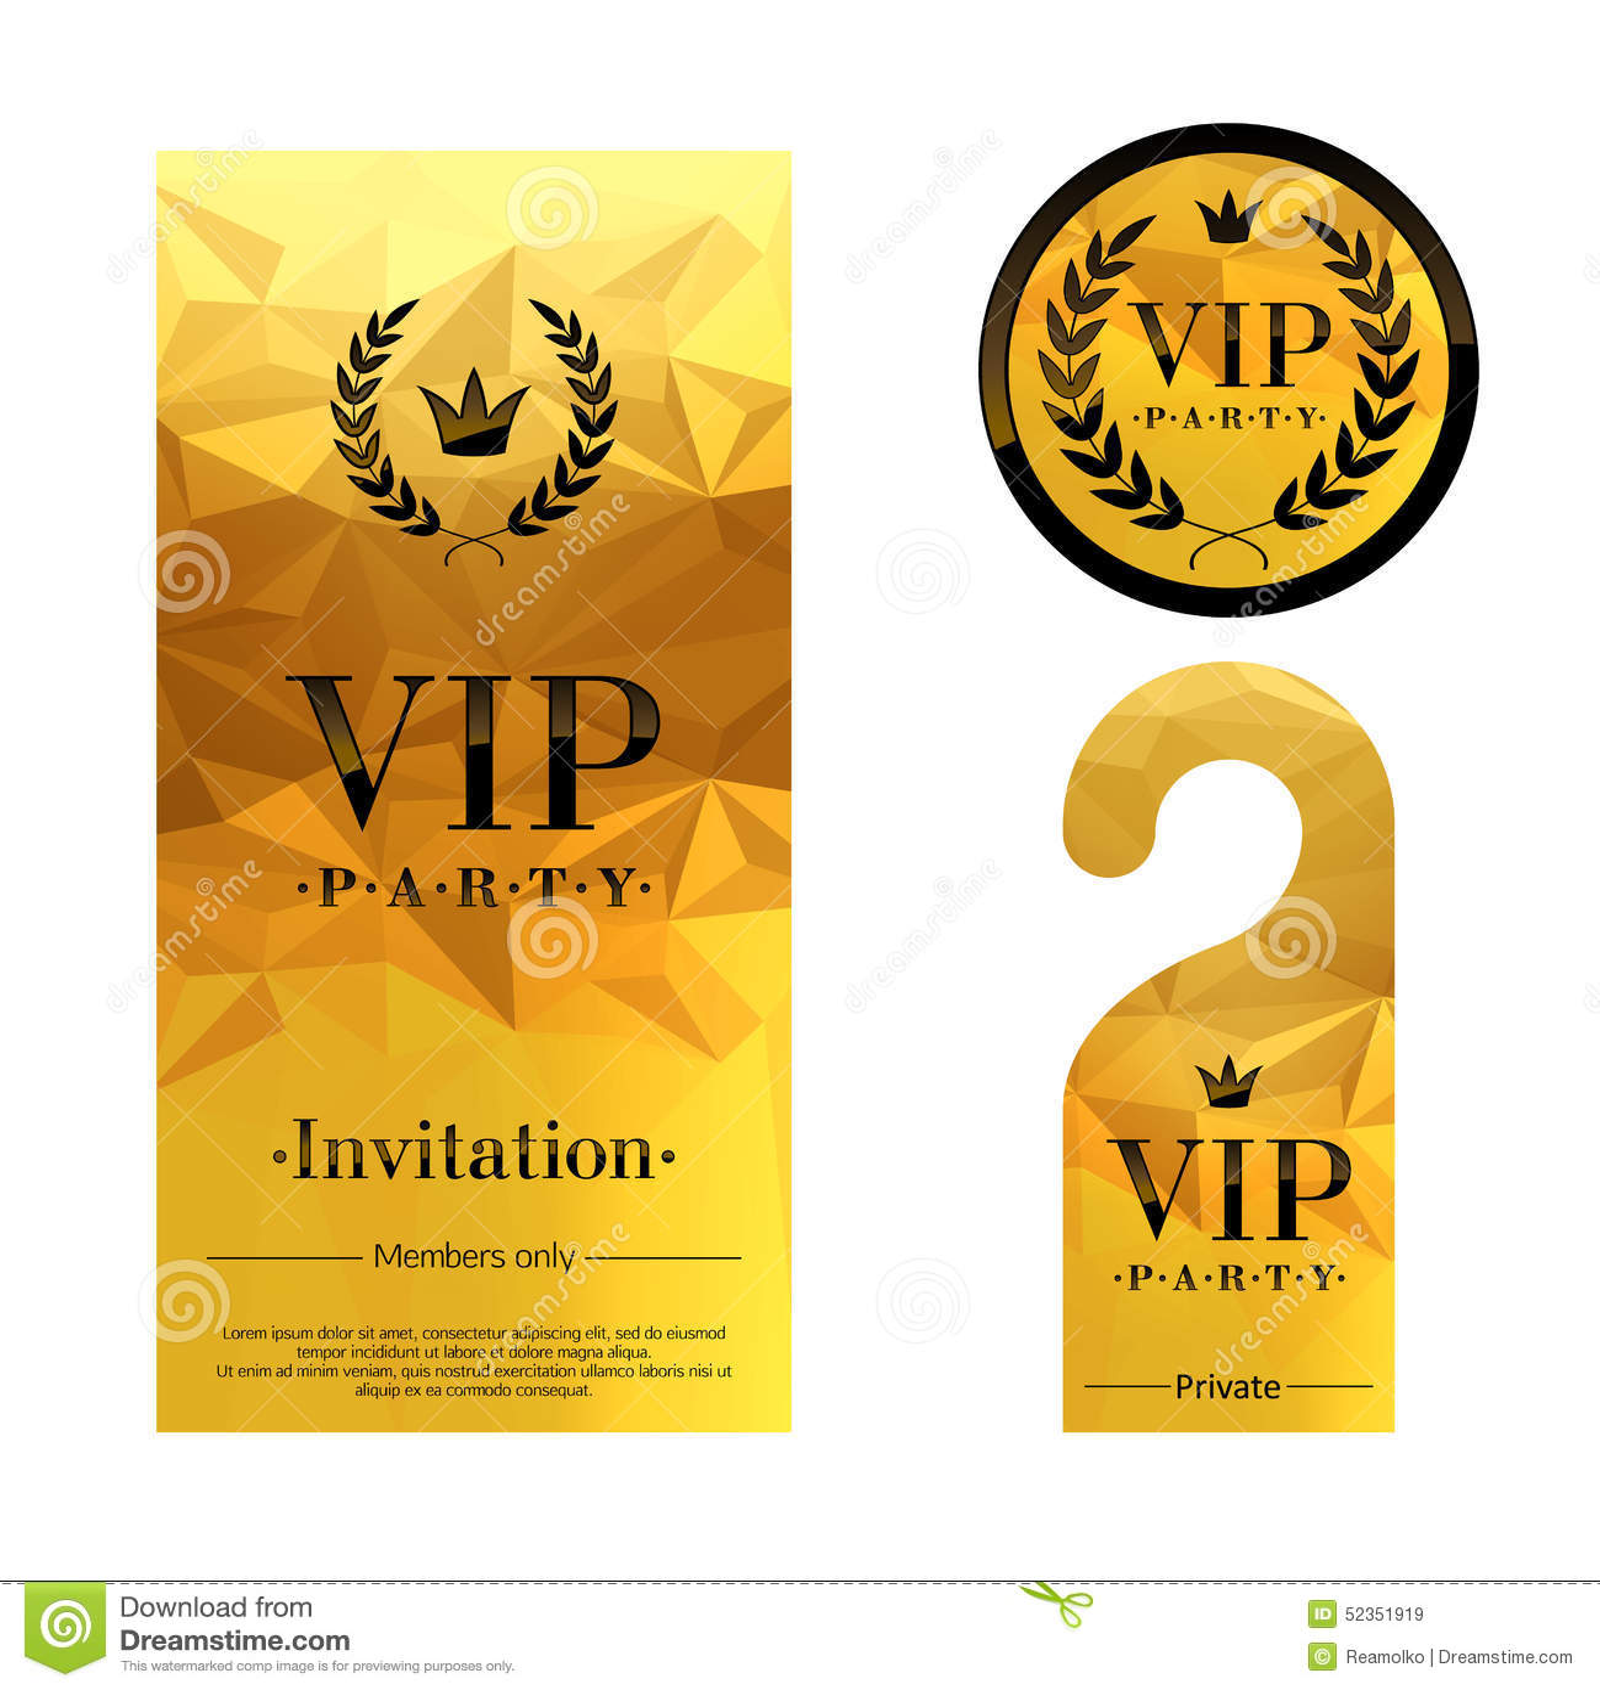 Vip Invitation Cards as great invitation sample